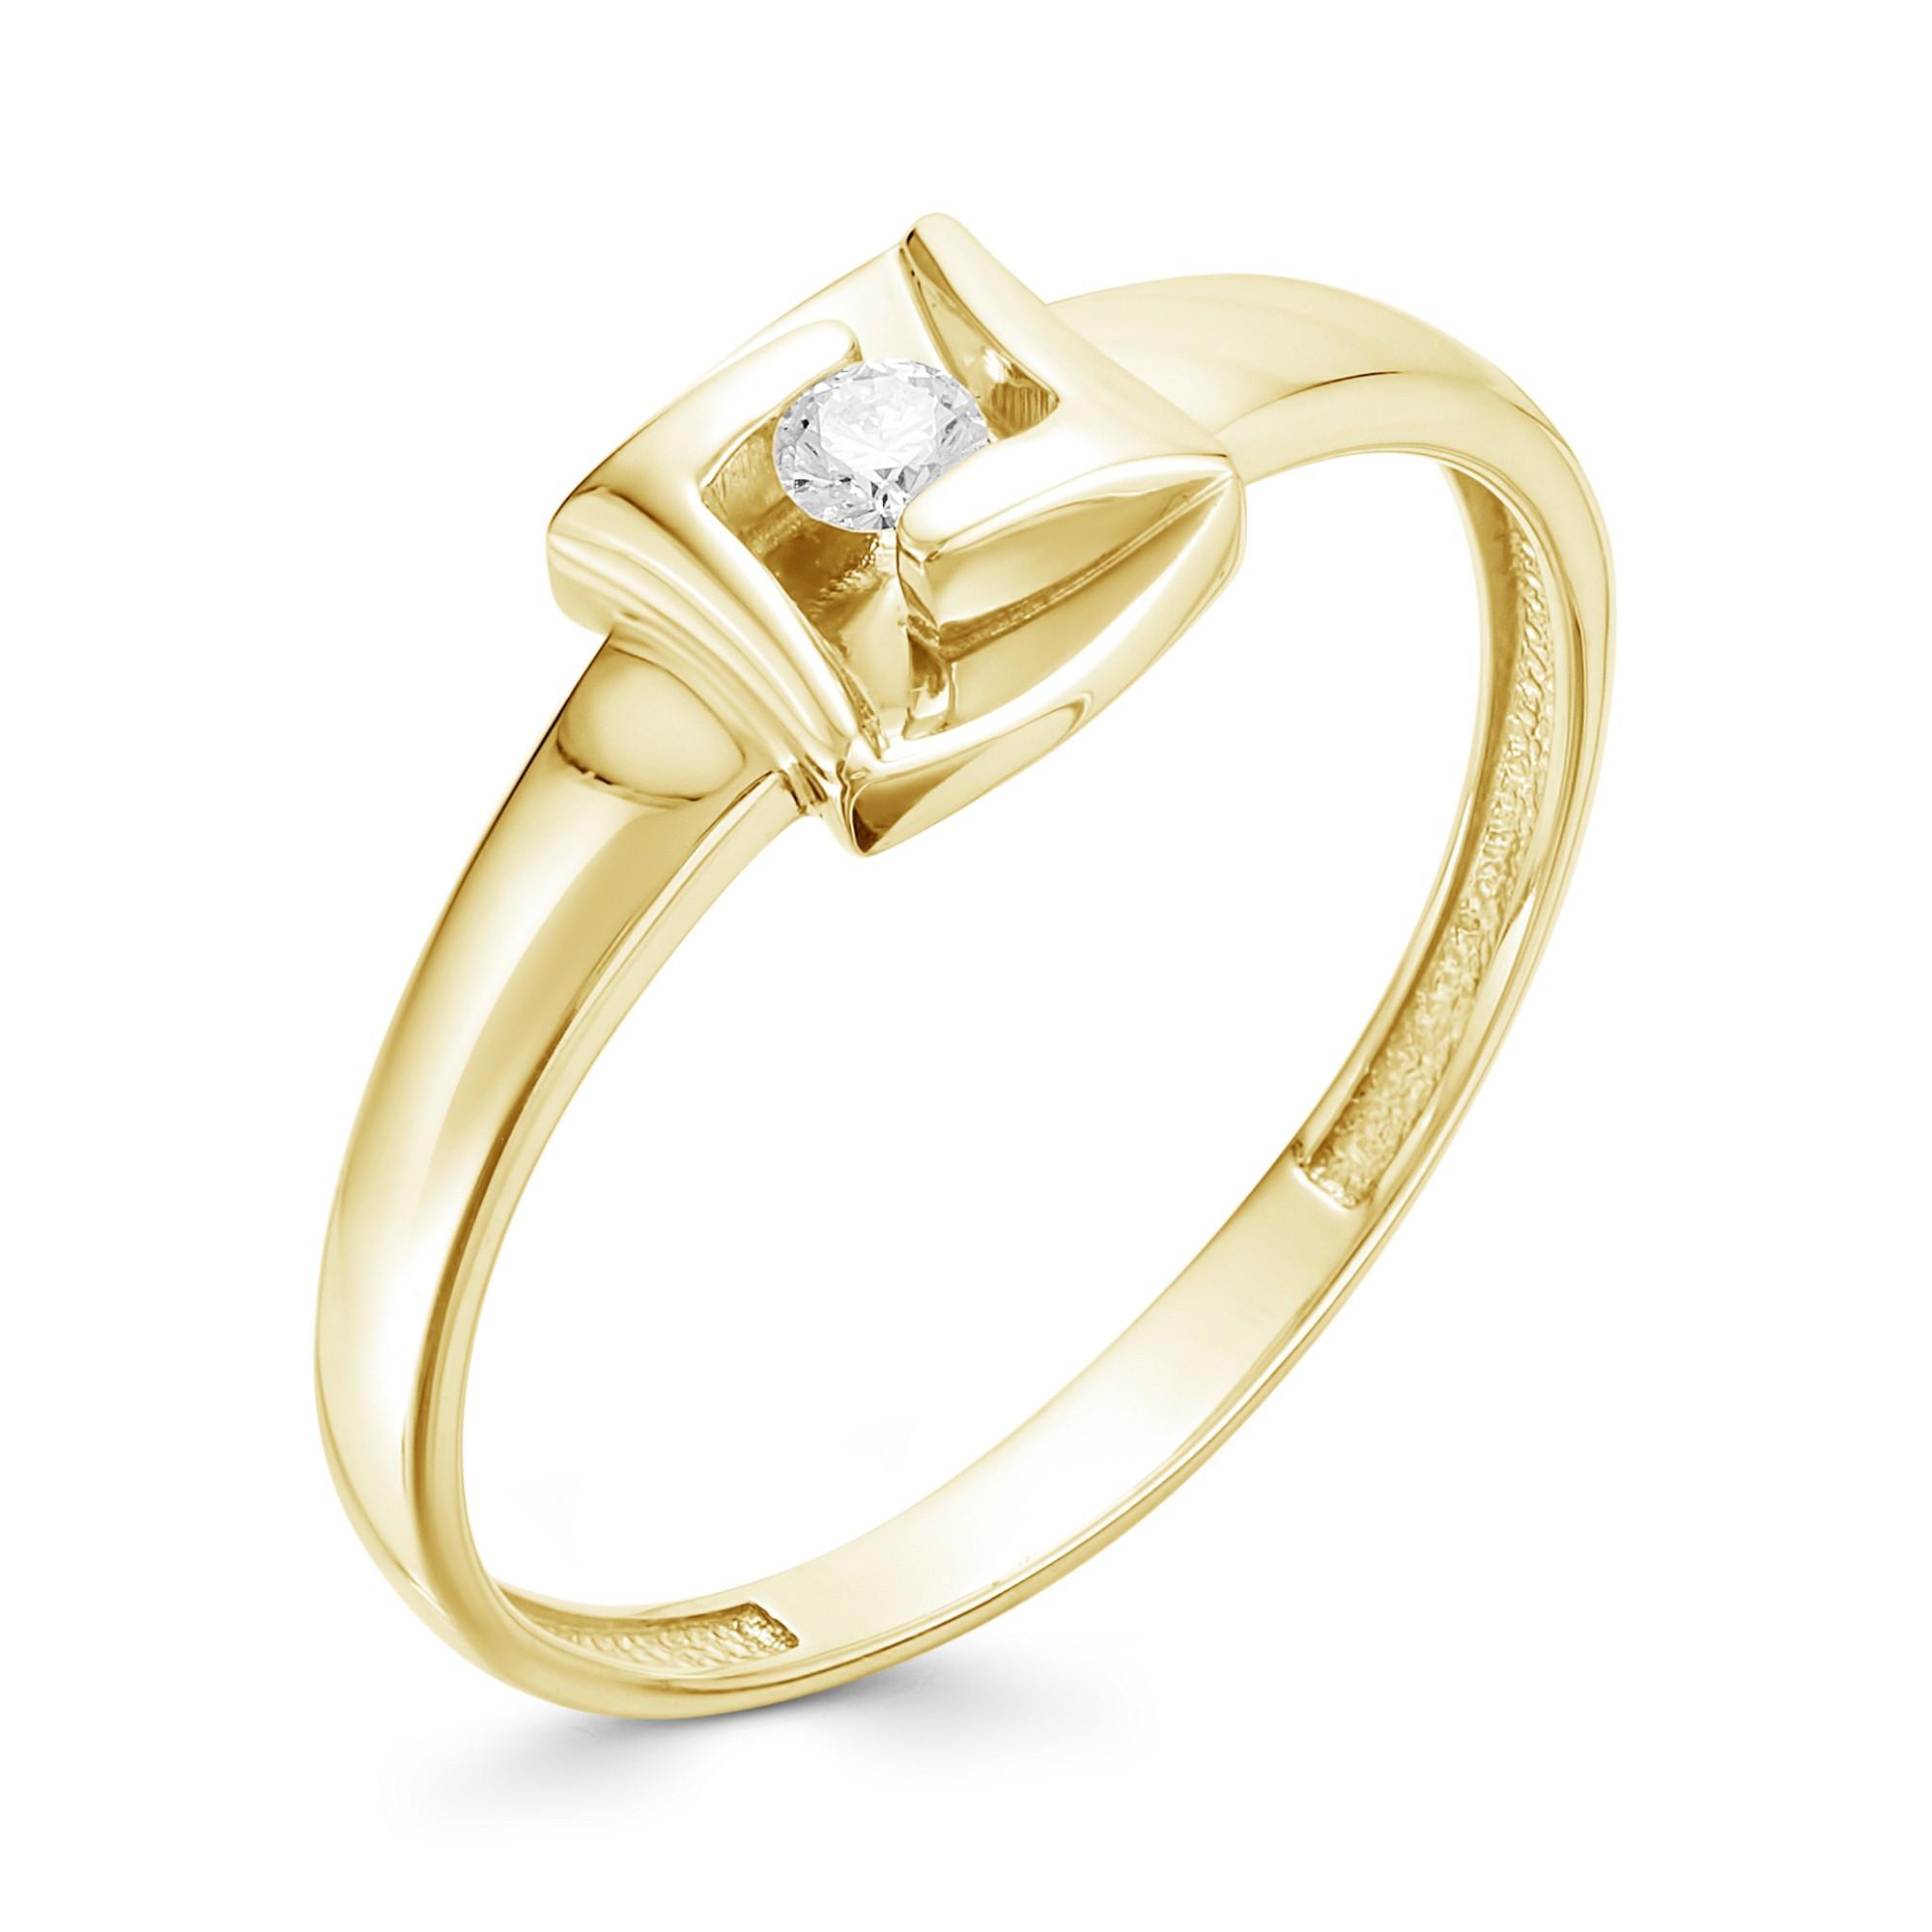 картинка кольцо 12716-300 1 бриллиант круг 57 0,058 15-20 3/6а 12716-300